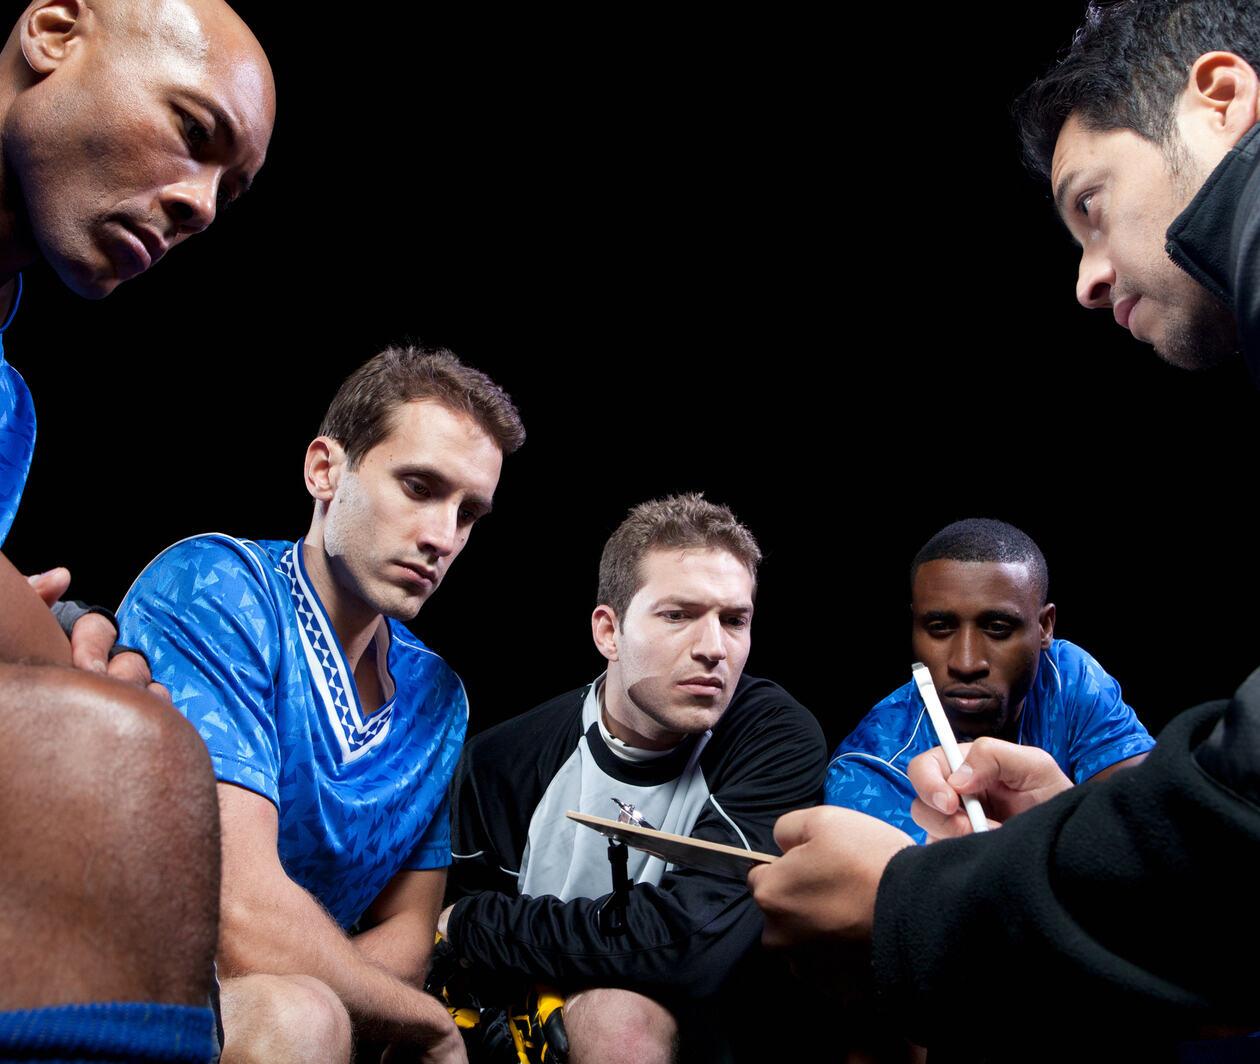 Coaching Skills: A changing landscape